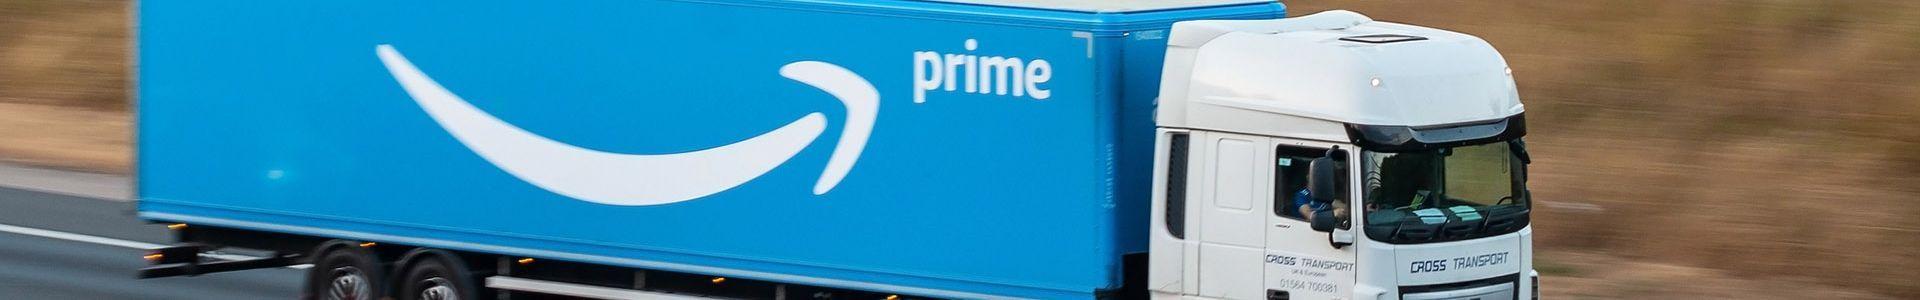 Carte Cadeau Amazon Suisse